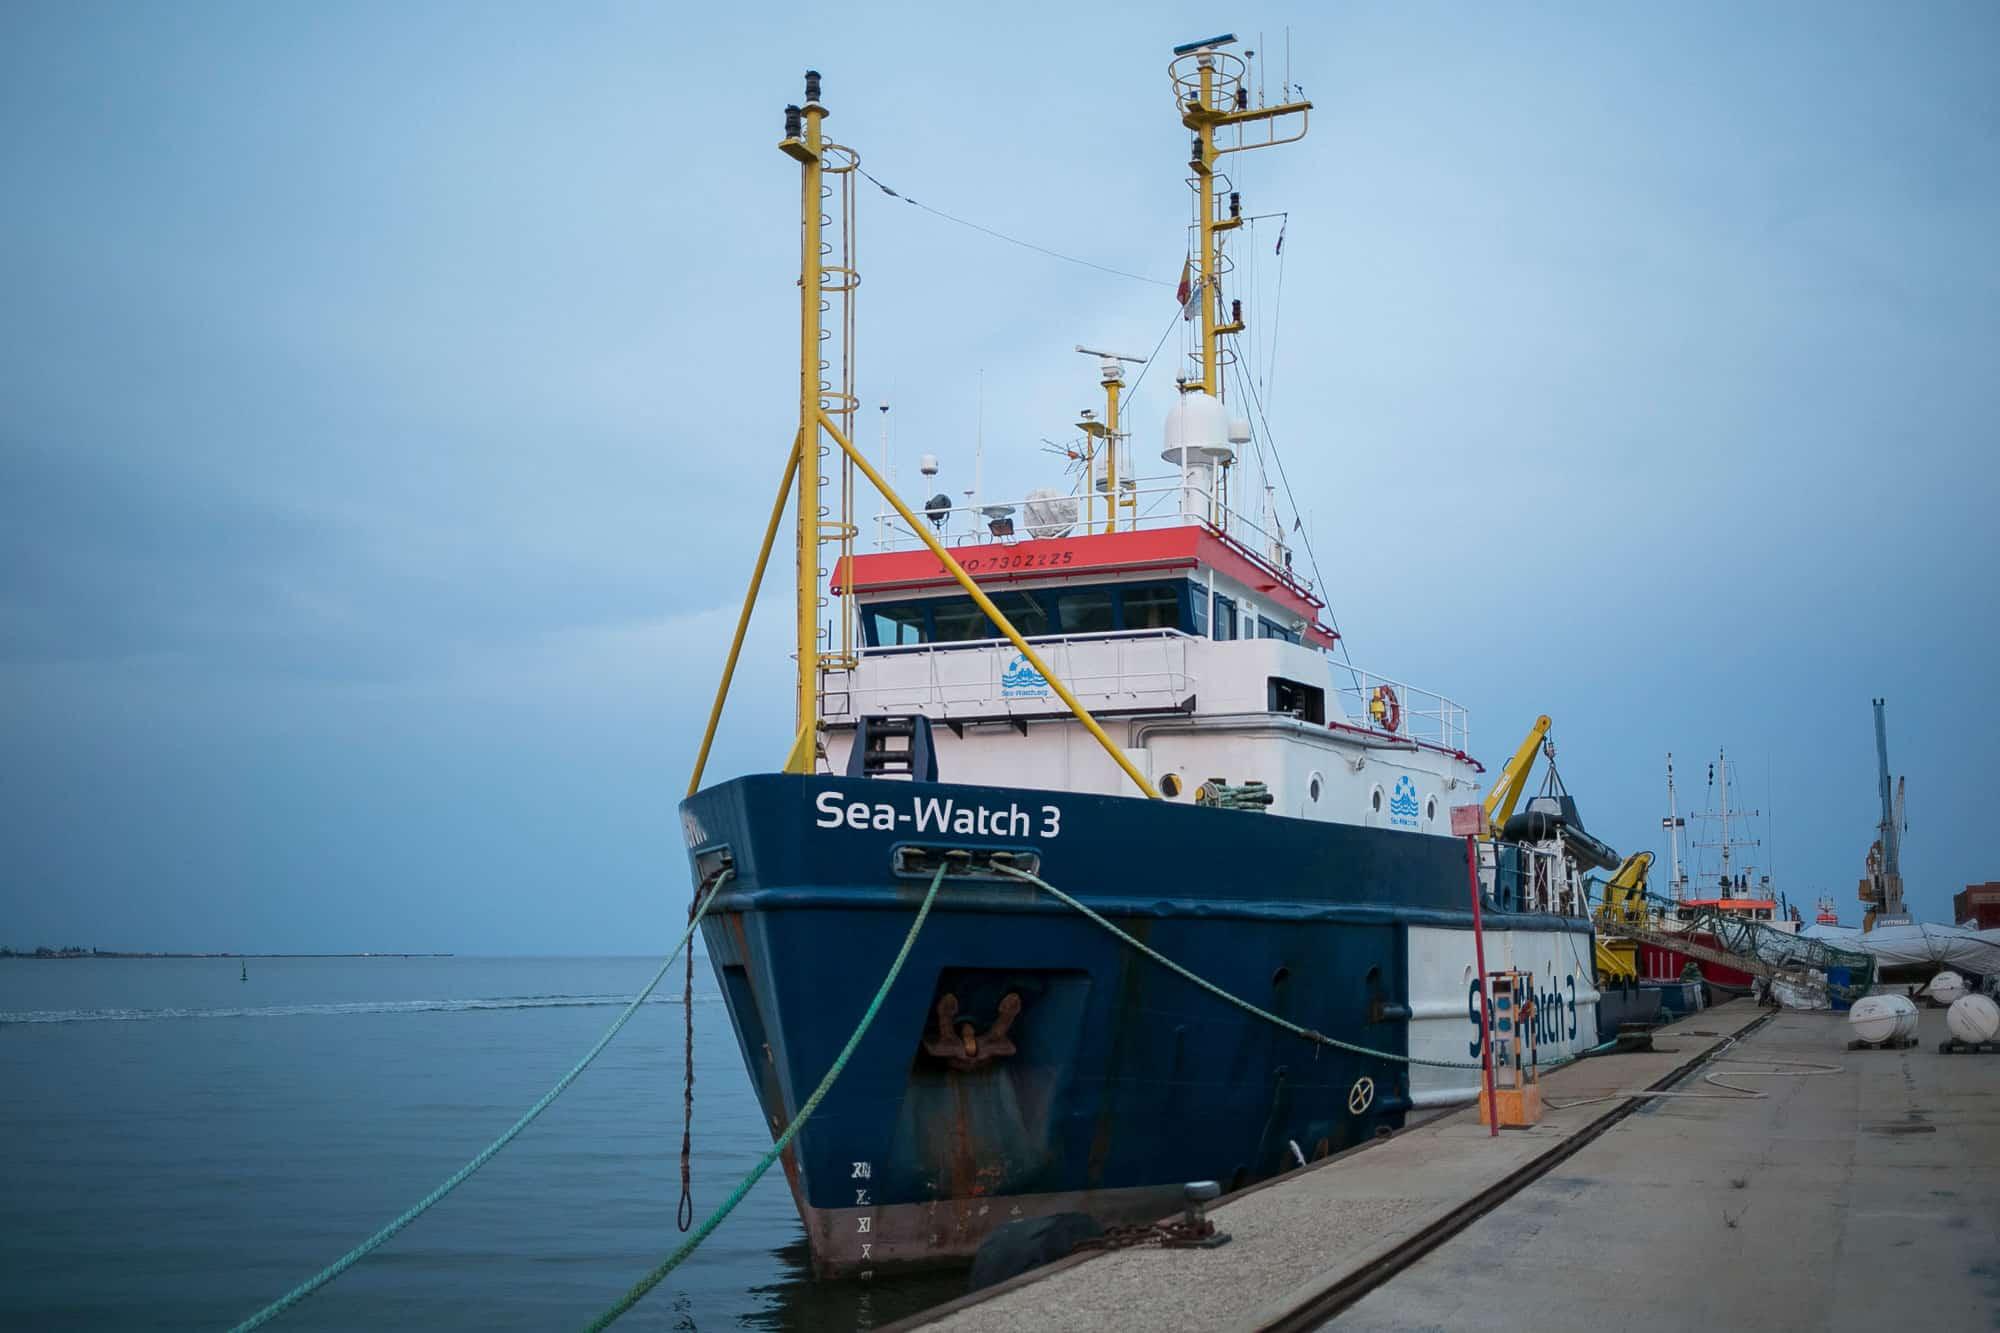 sea watch - photo #14